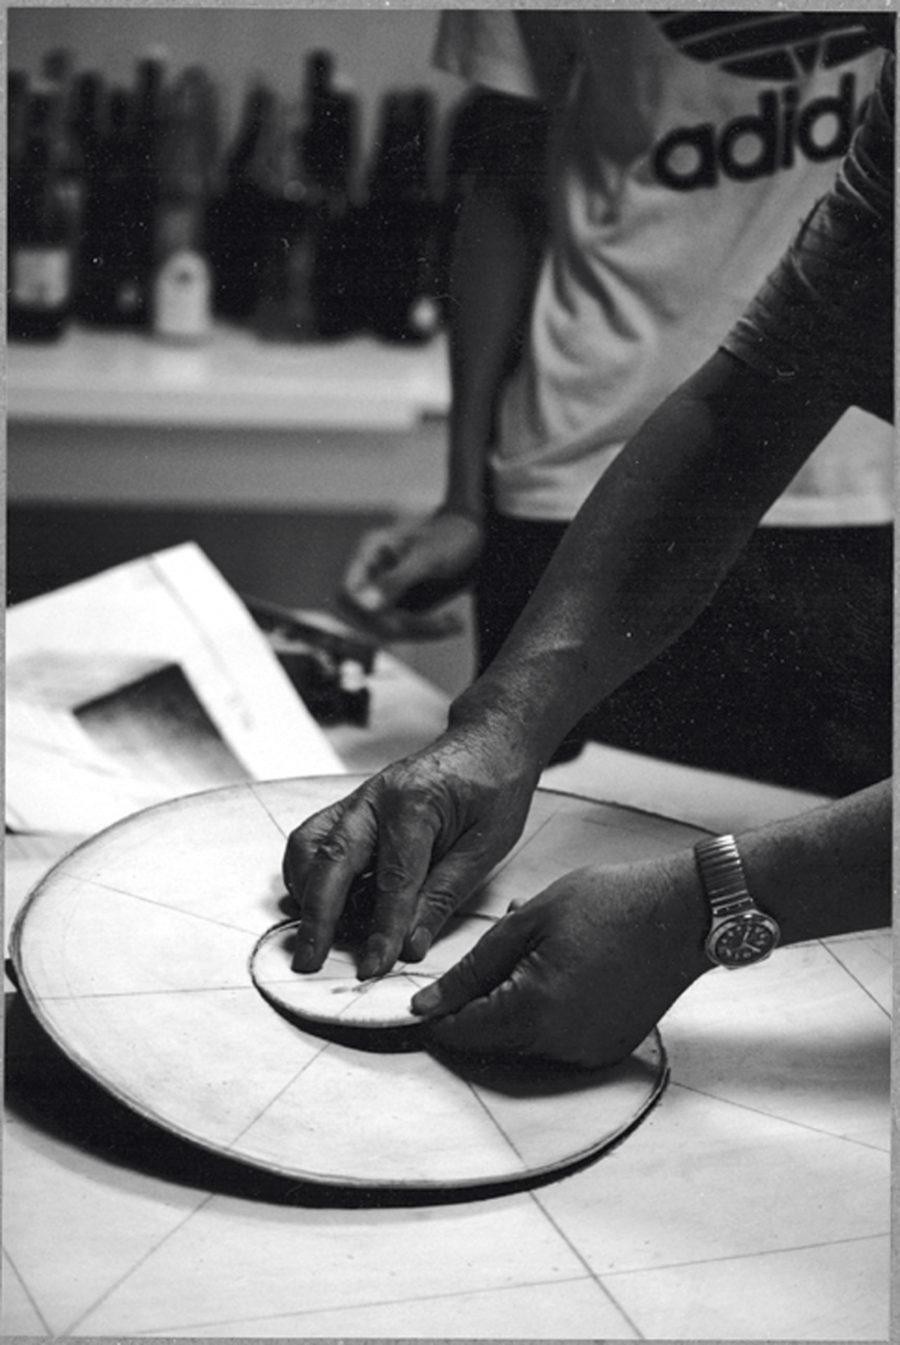 Ferrari creating wood templates for the creation of Cristalli in formazione